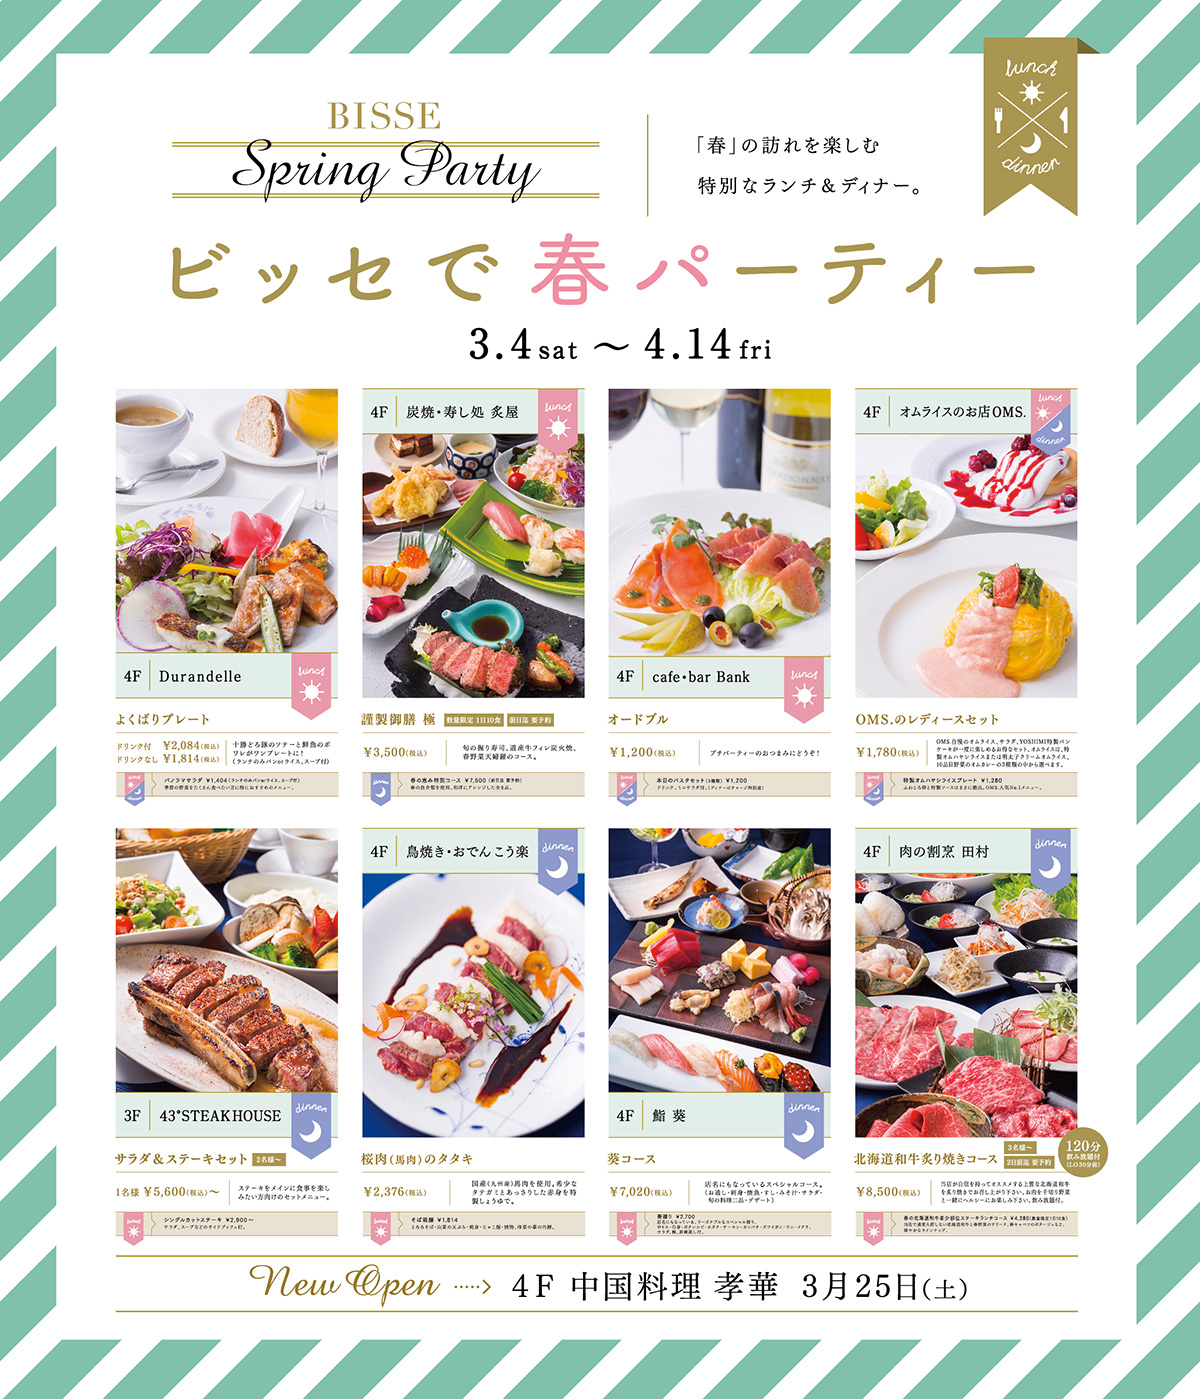 http://www.odori-bisse.com/info/up_images/news_170303_img01.jpg